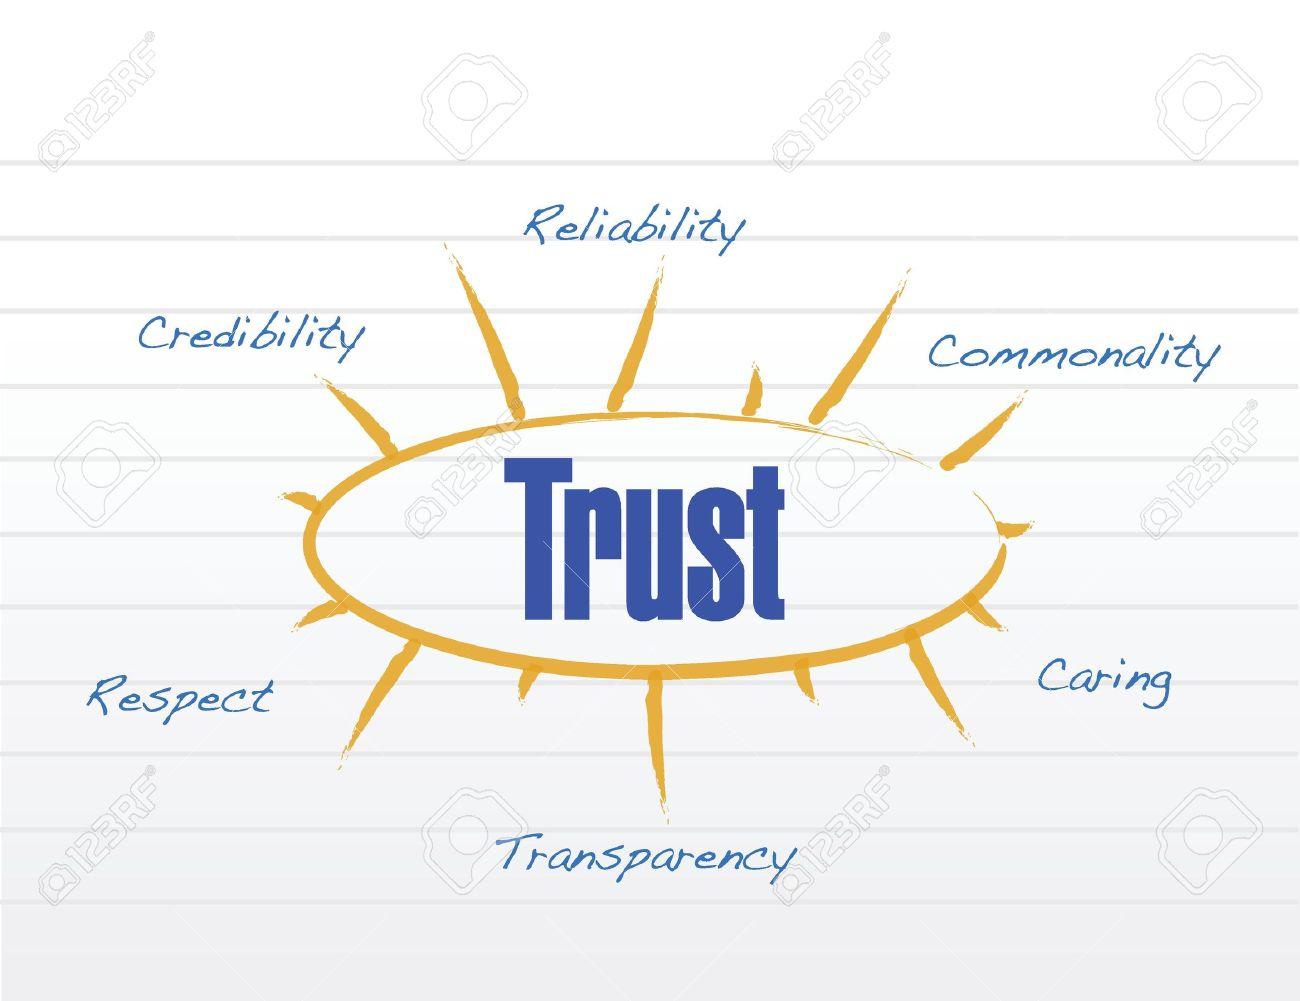 What Is Trust Model